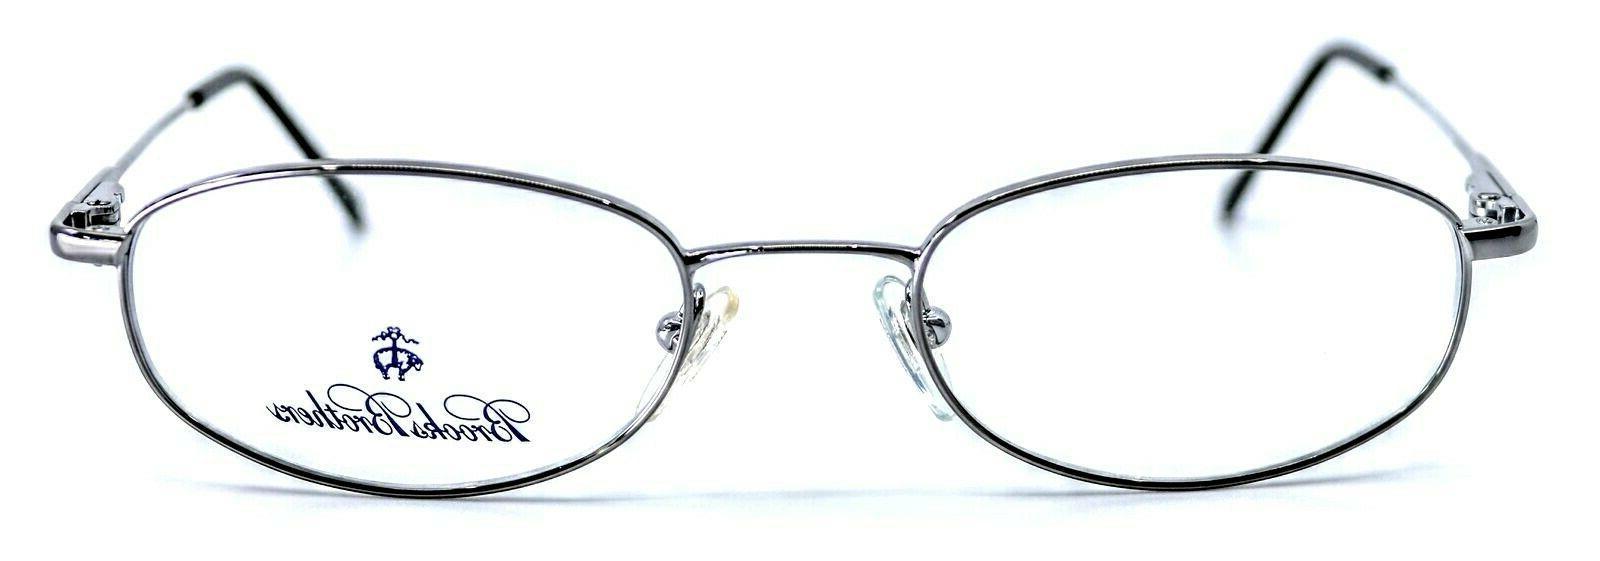 BROOKS BB491 1150 Gunmetal Oval Eyeglass 49-19-135